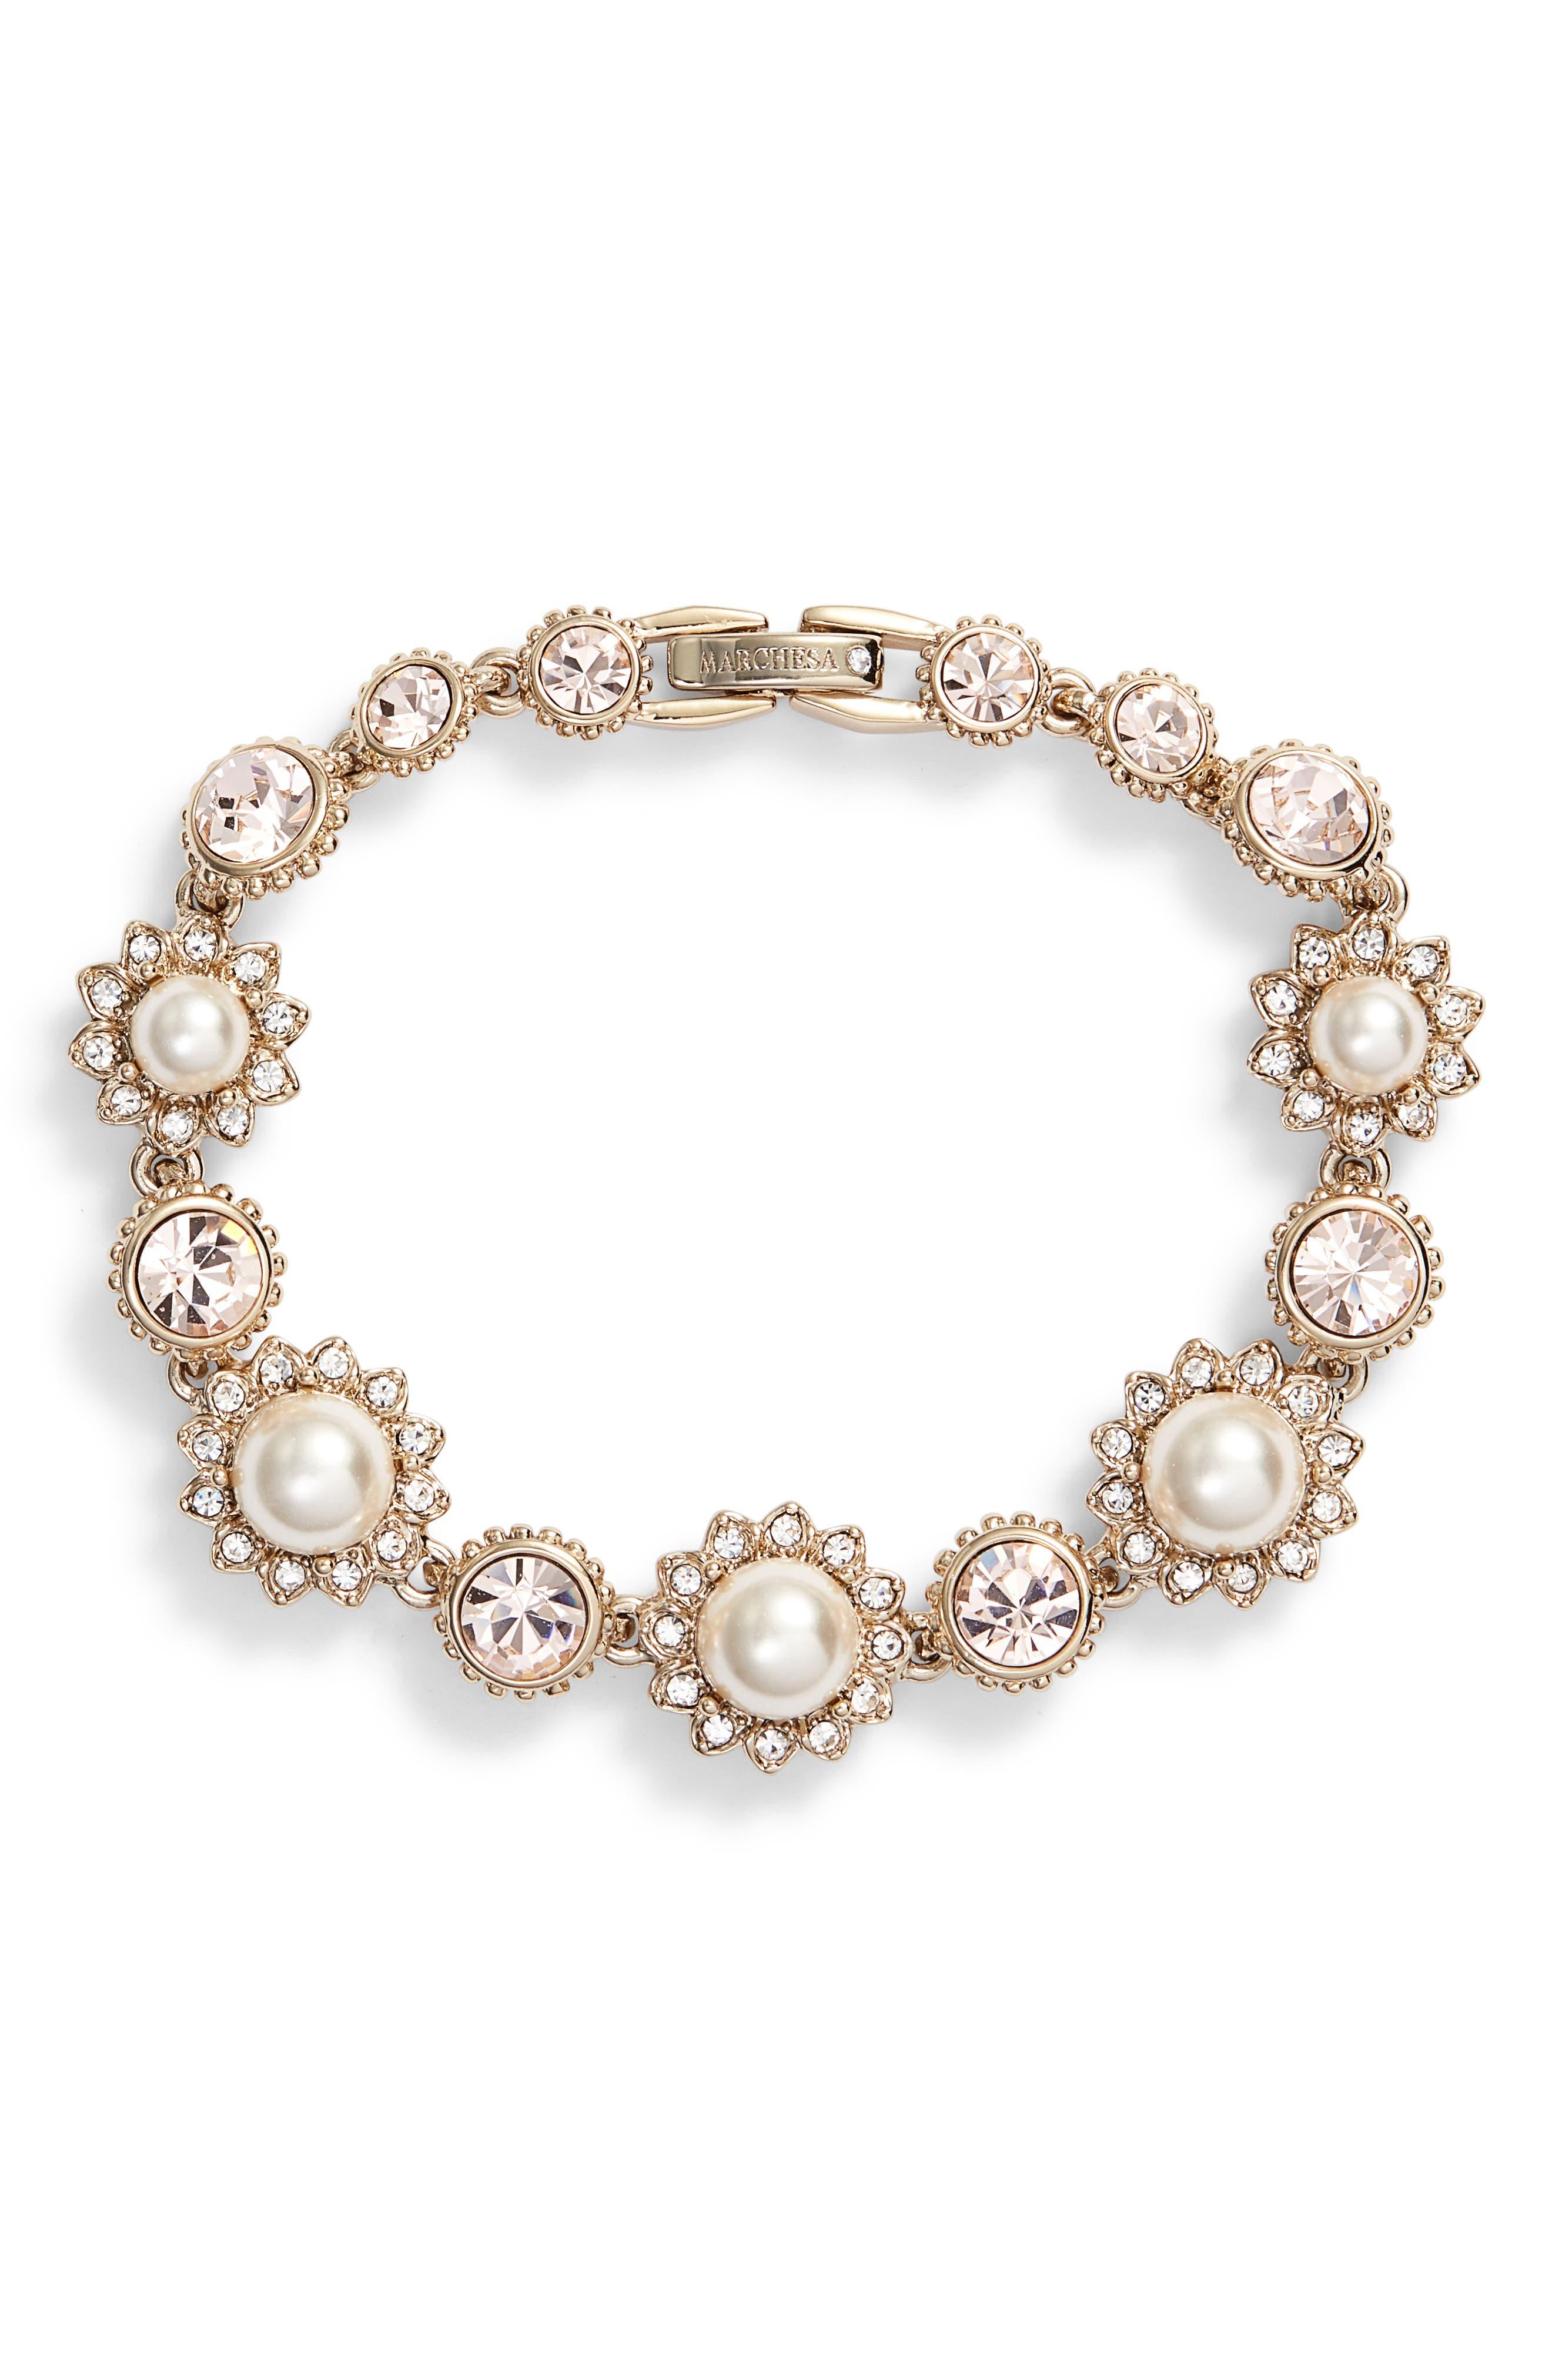 MARCHESA Imitation Pearl Line Bracelet, Main, color, CREAM/ SILK/ GOLD